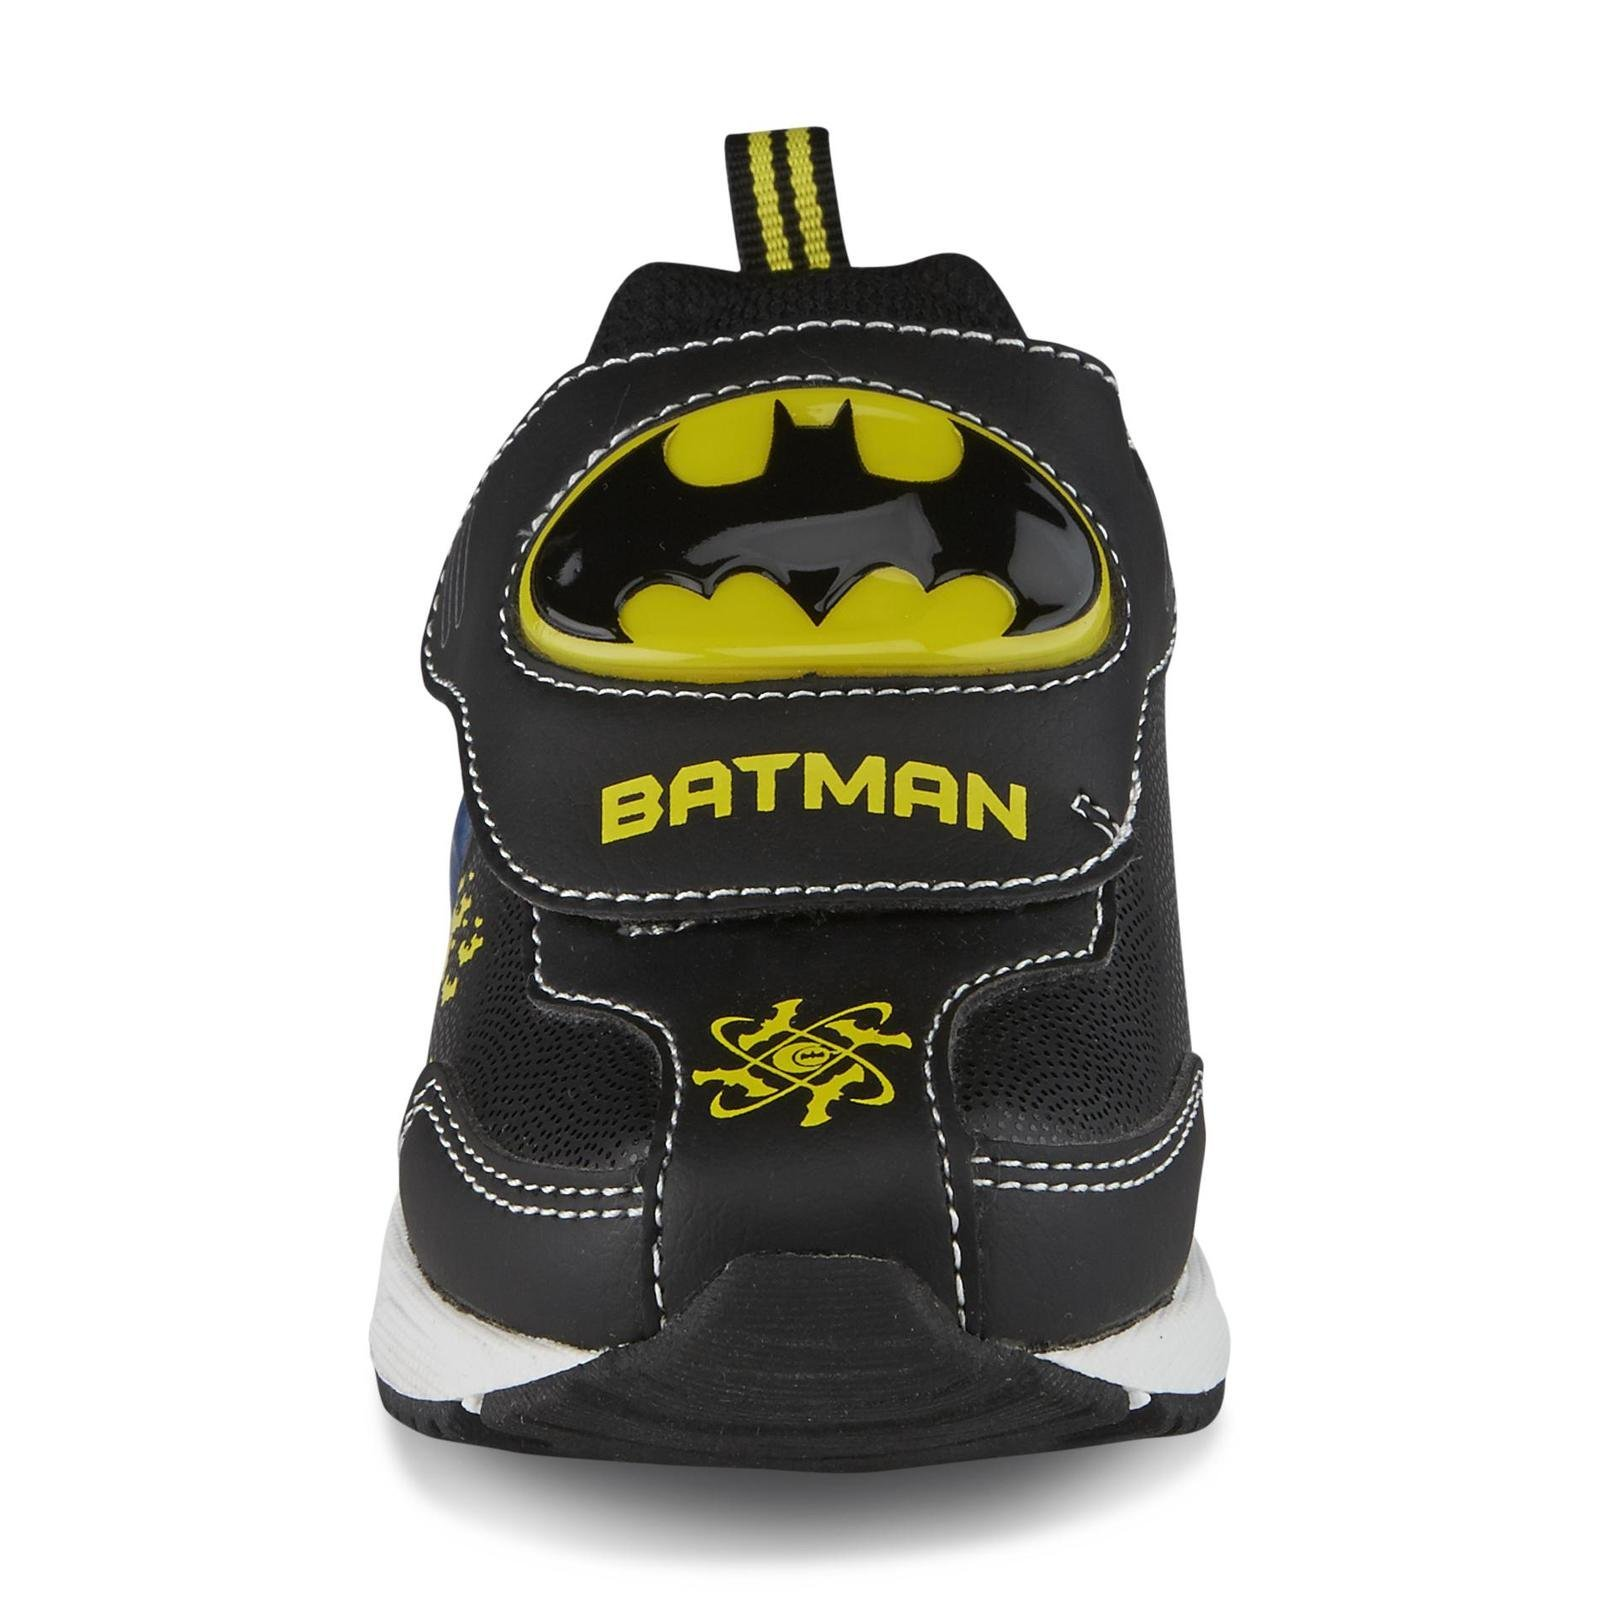 c2ebe9b49667c4 Galleon - DC Comics Toddler Boy s Batman Sneakers Athletic Shoe ...